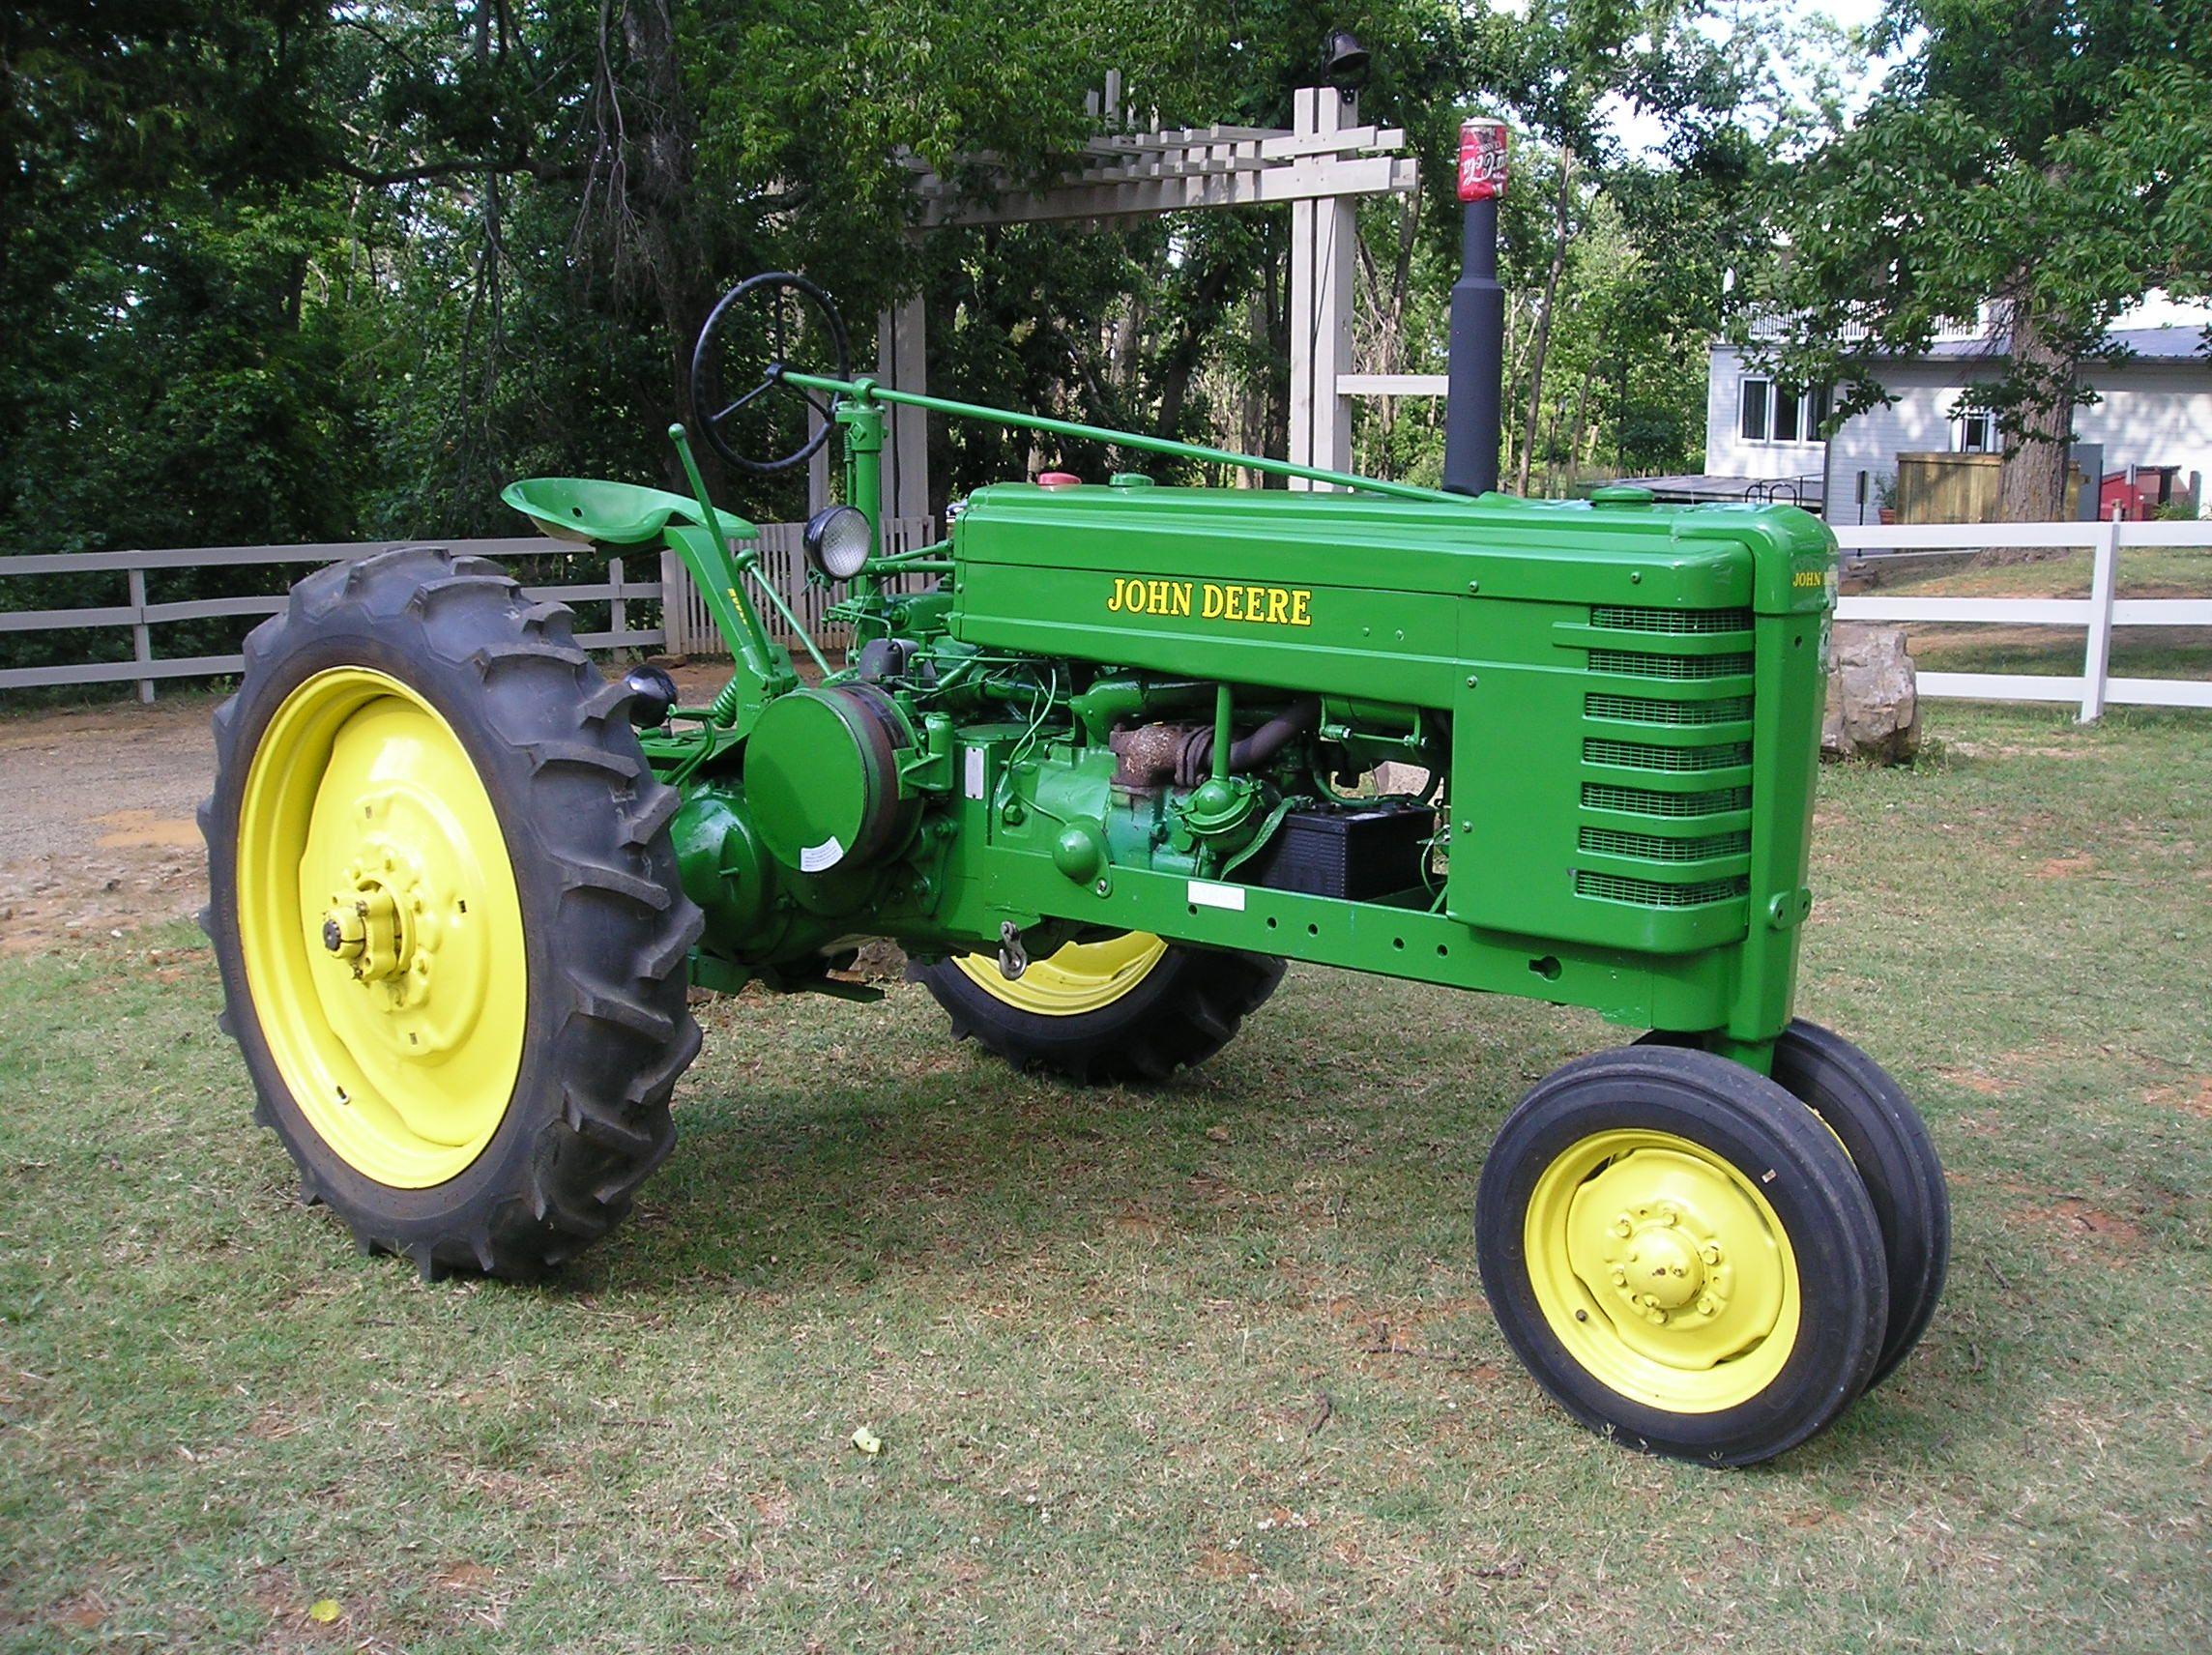 Rare John Deere Tractors : Rare old tractors related keywords